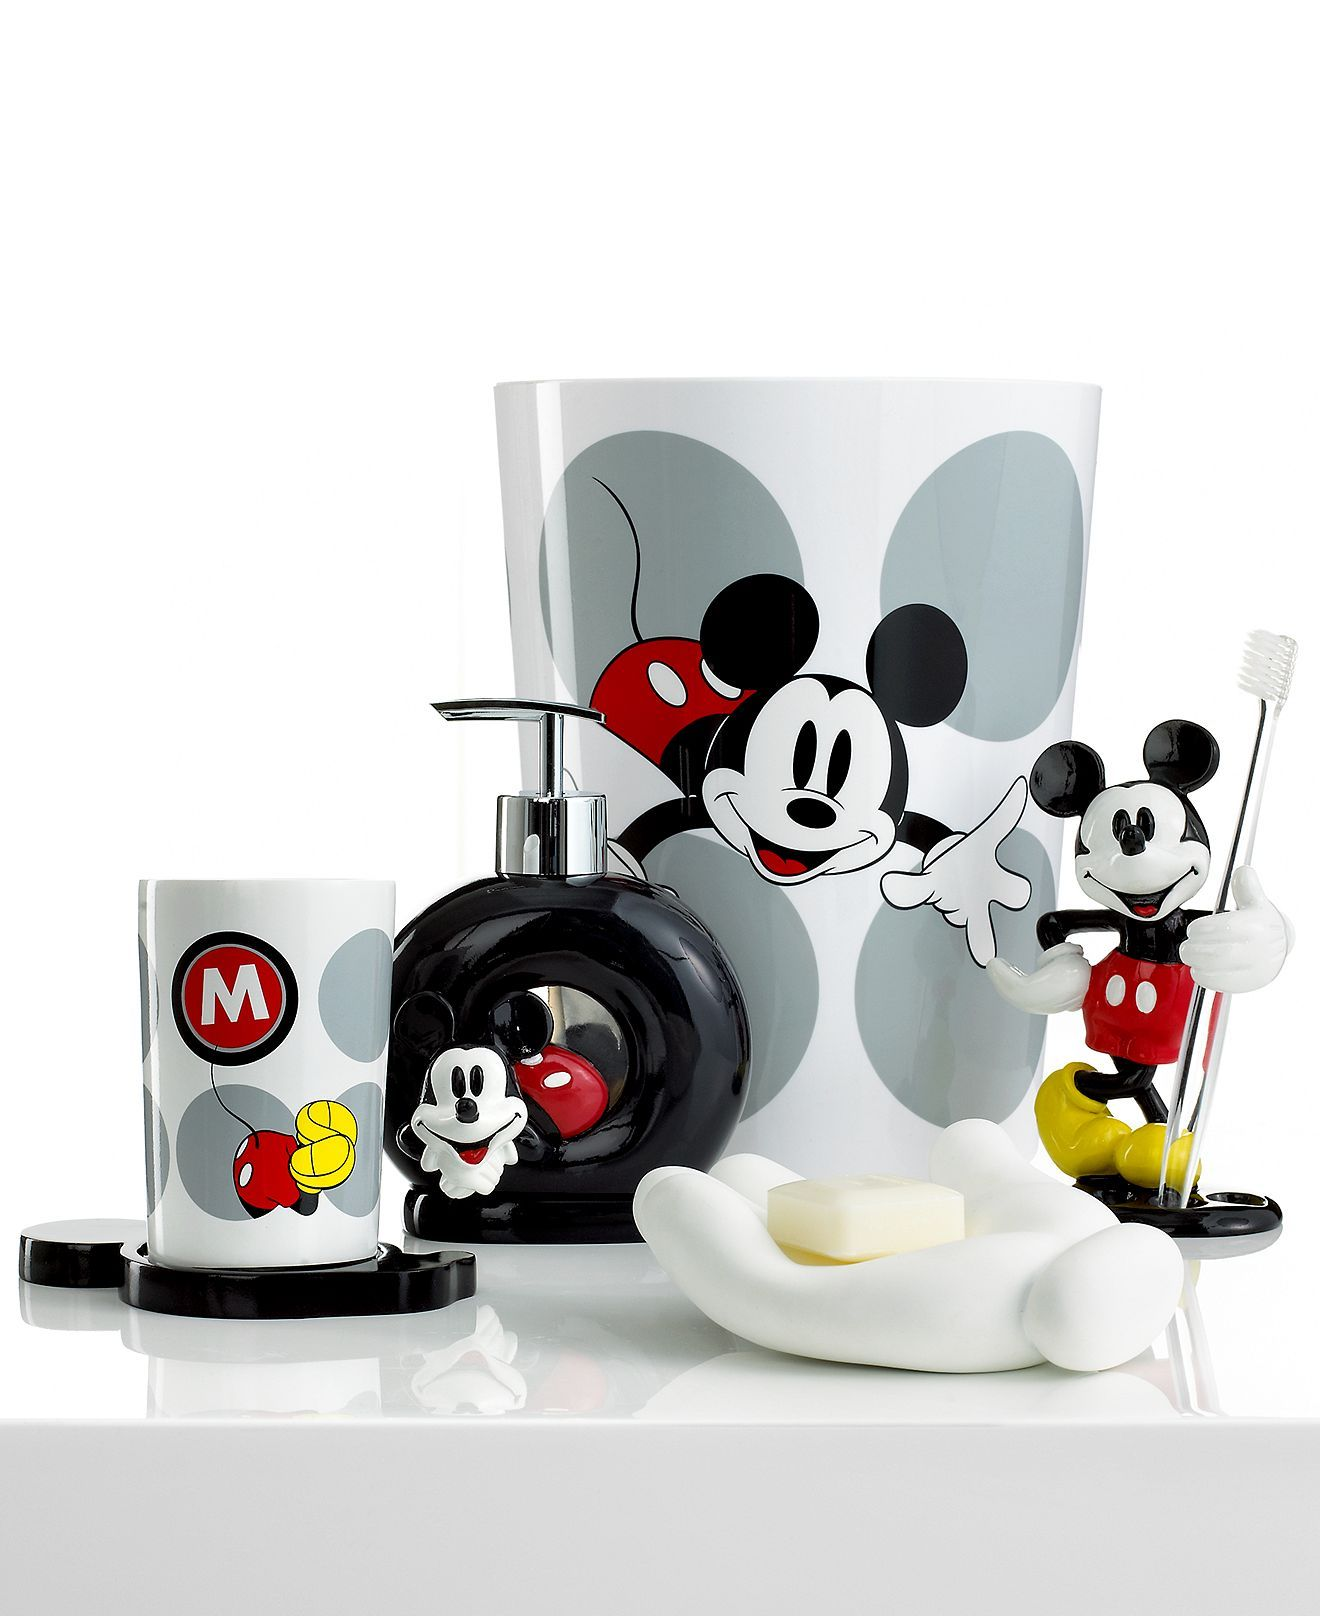 Superbe Disney Bath Accessories, Disney Mickey Mouse Bath Accessories   Guest  Bathroom